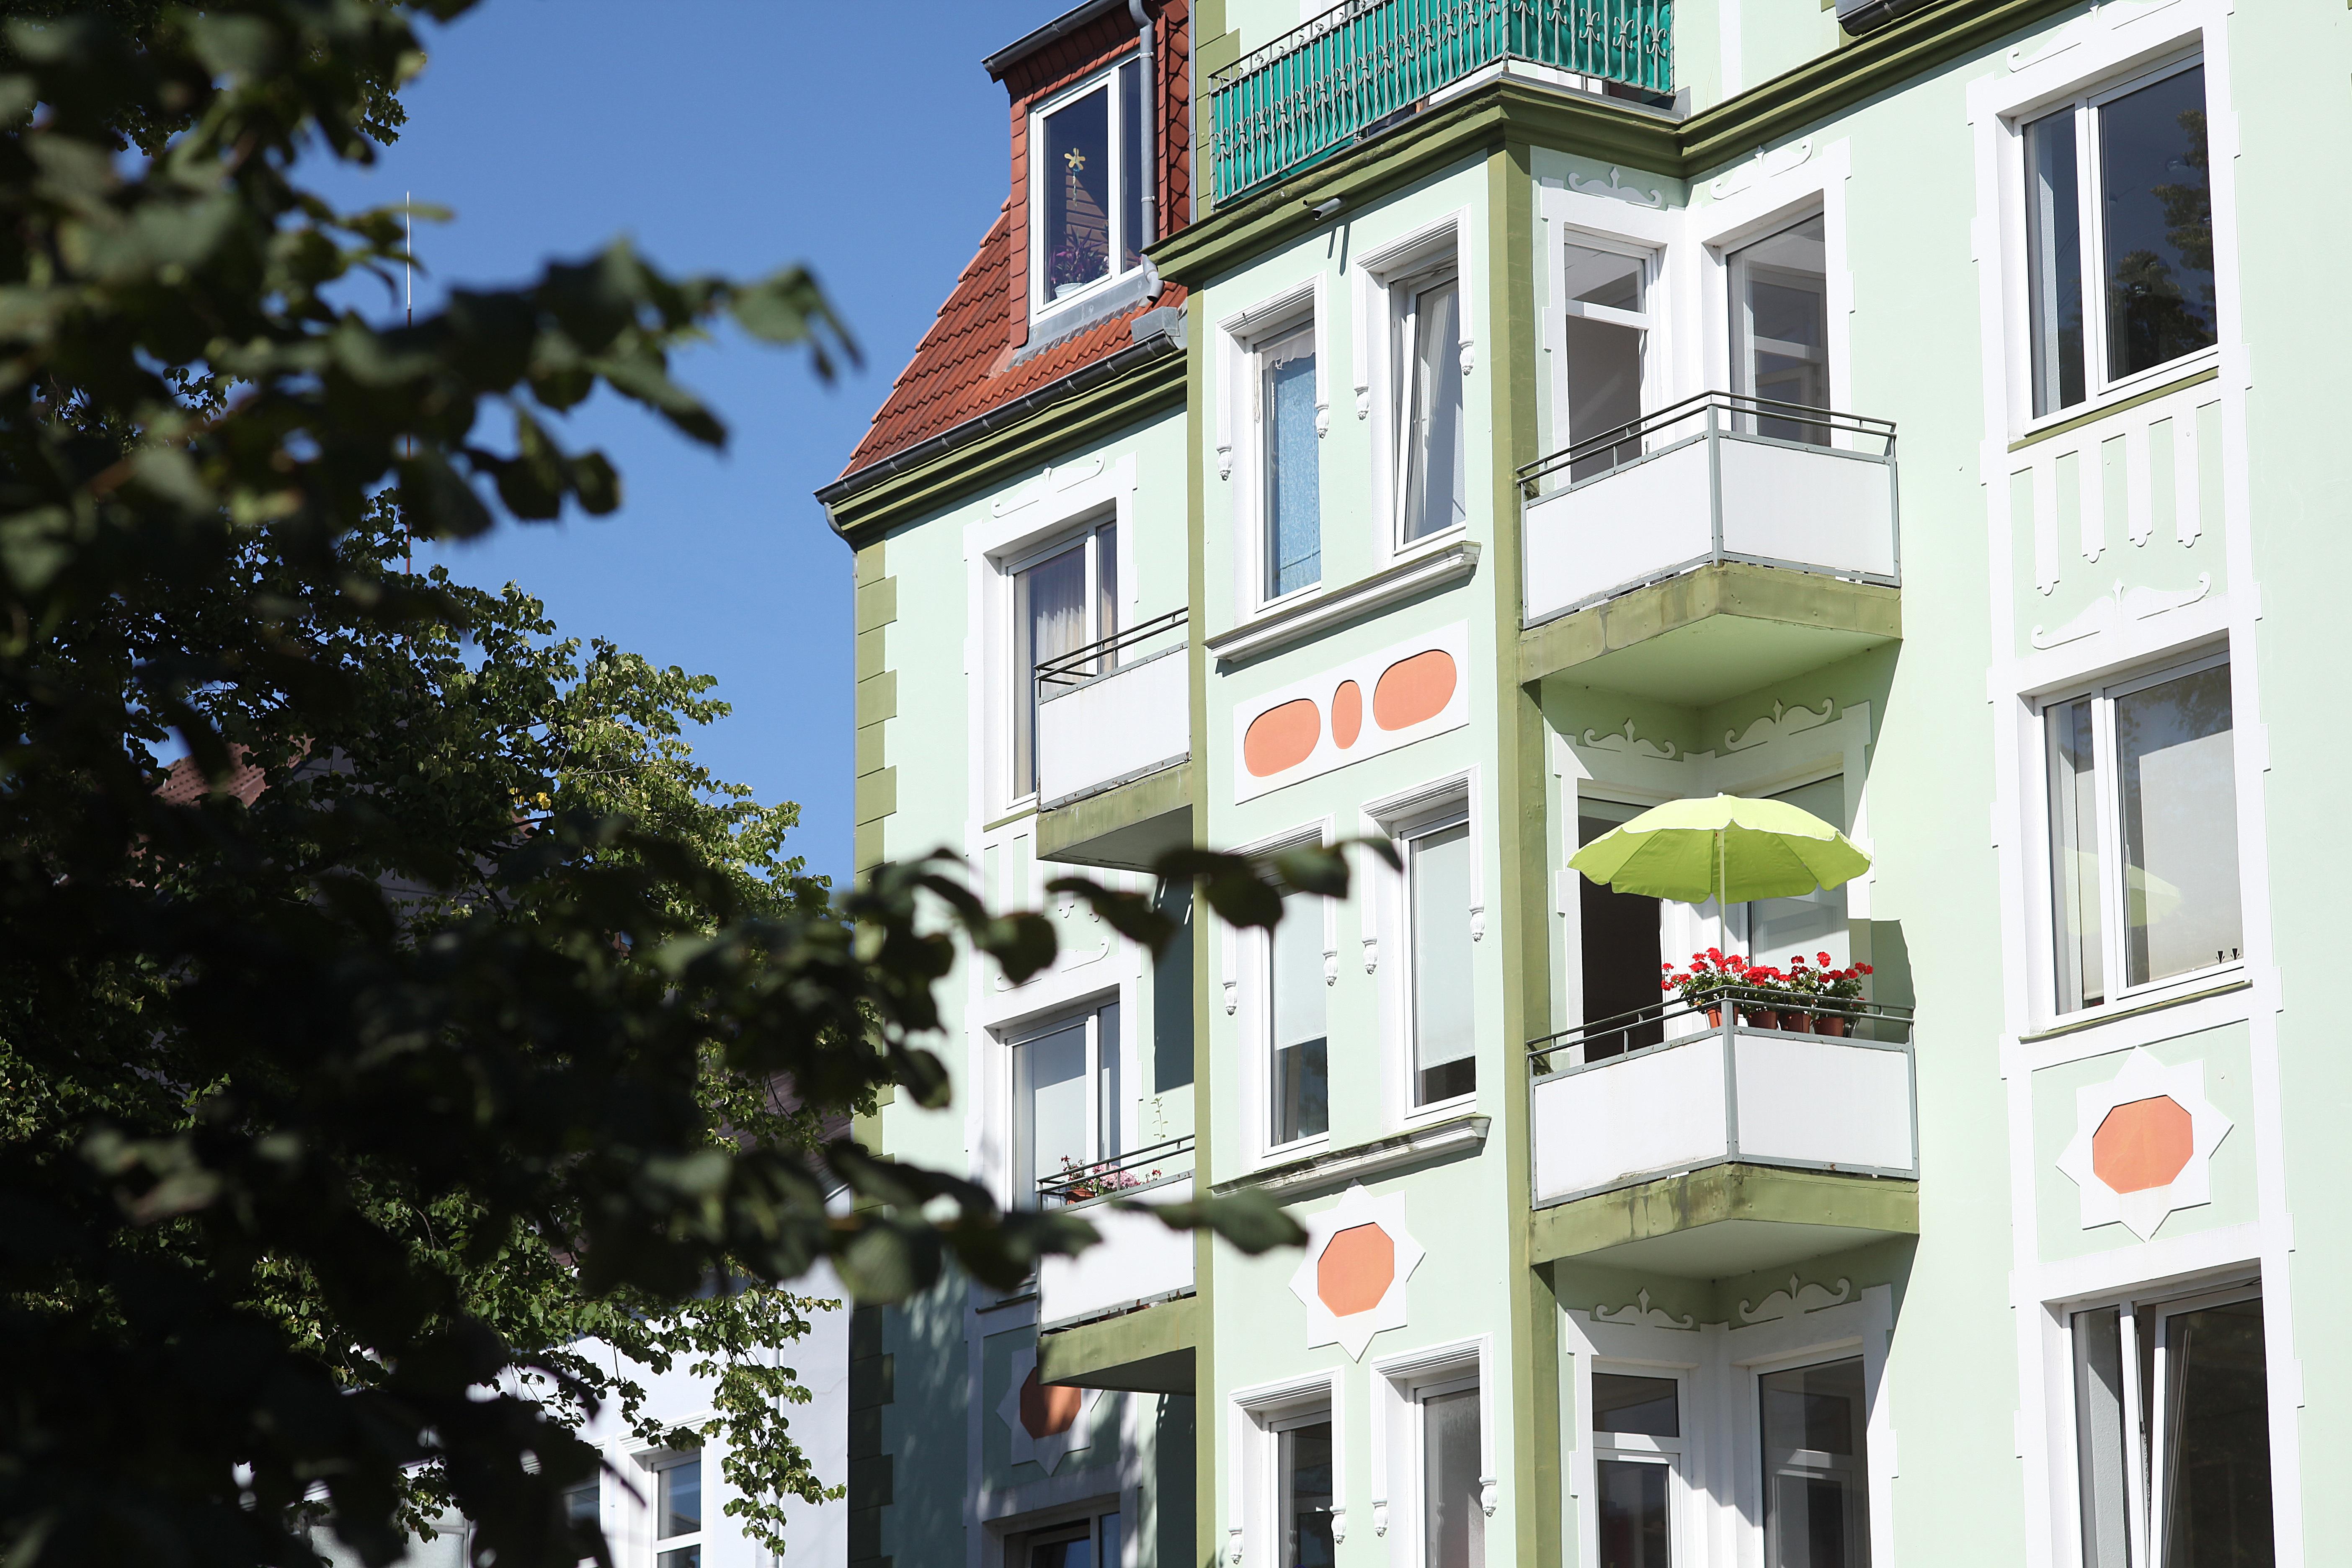 3v immobilien in berlin branchenbuch deutschland. Black Bedroom Furniture Sets. Home Design Ideas